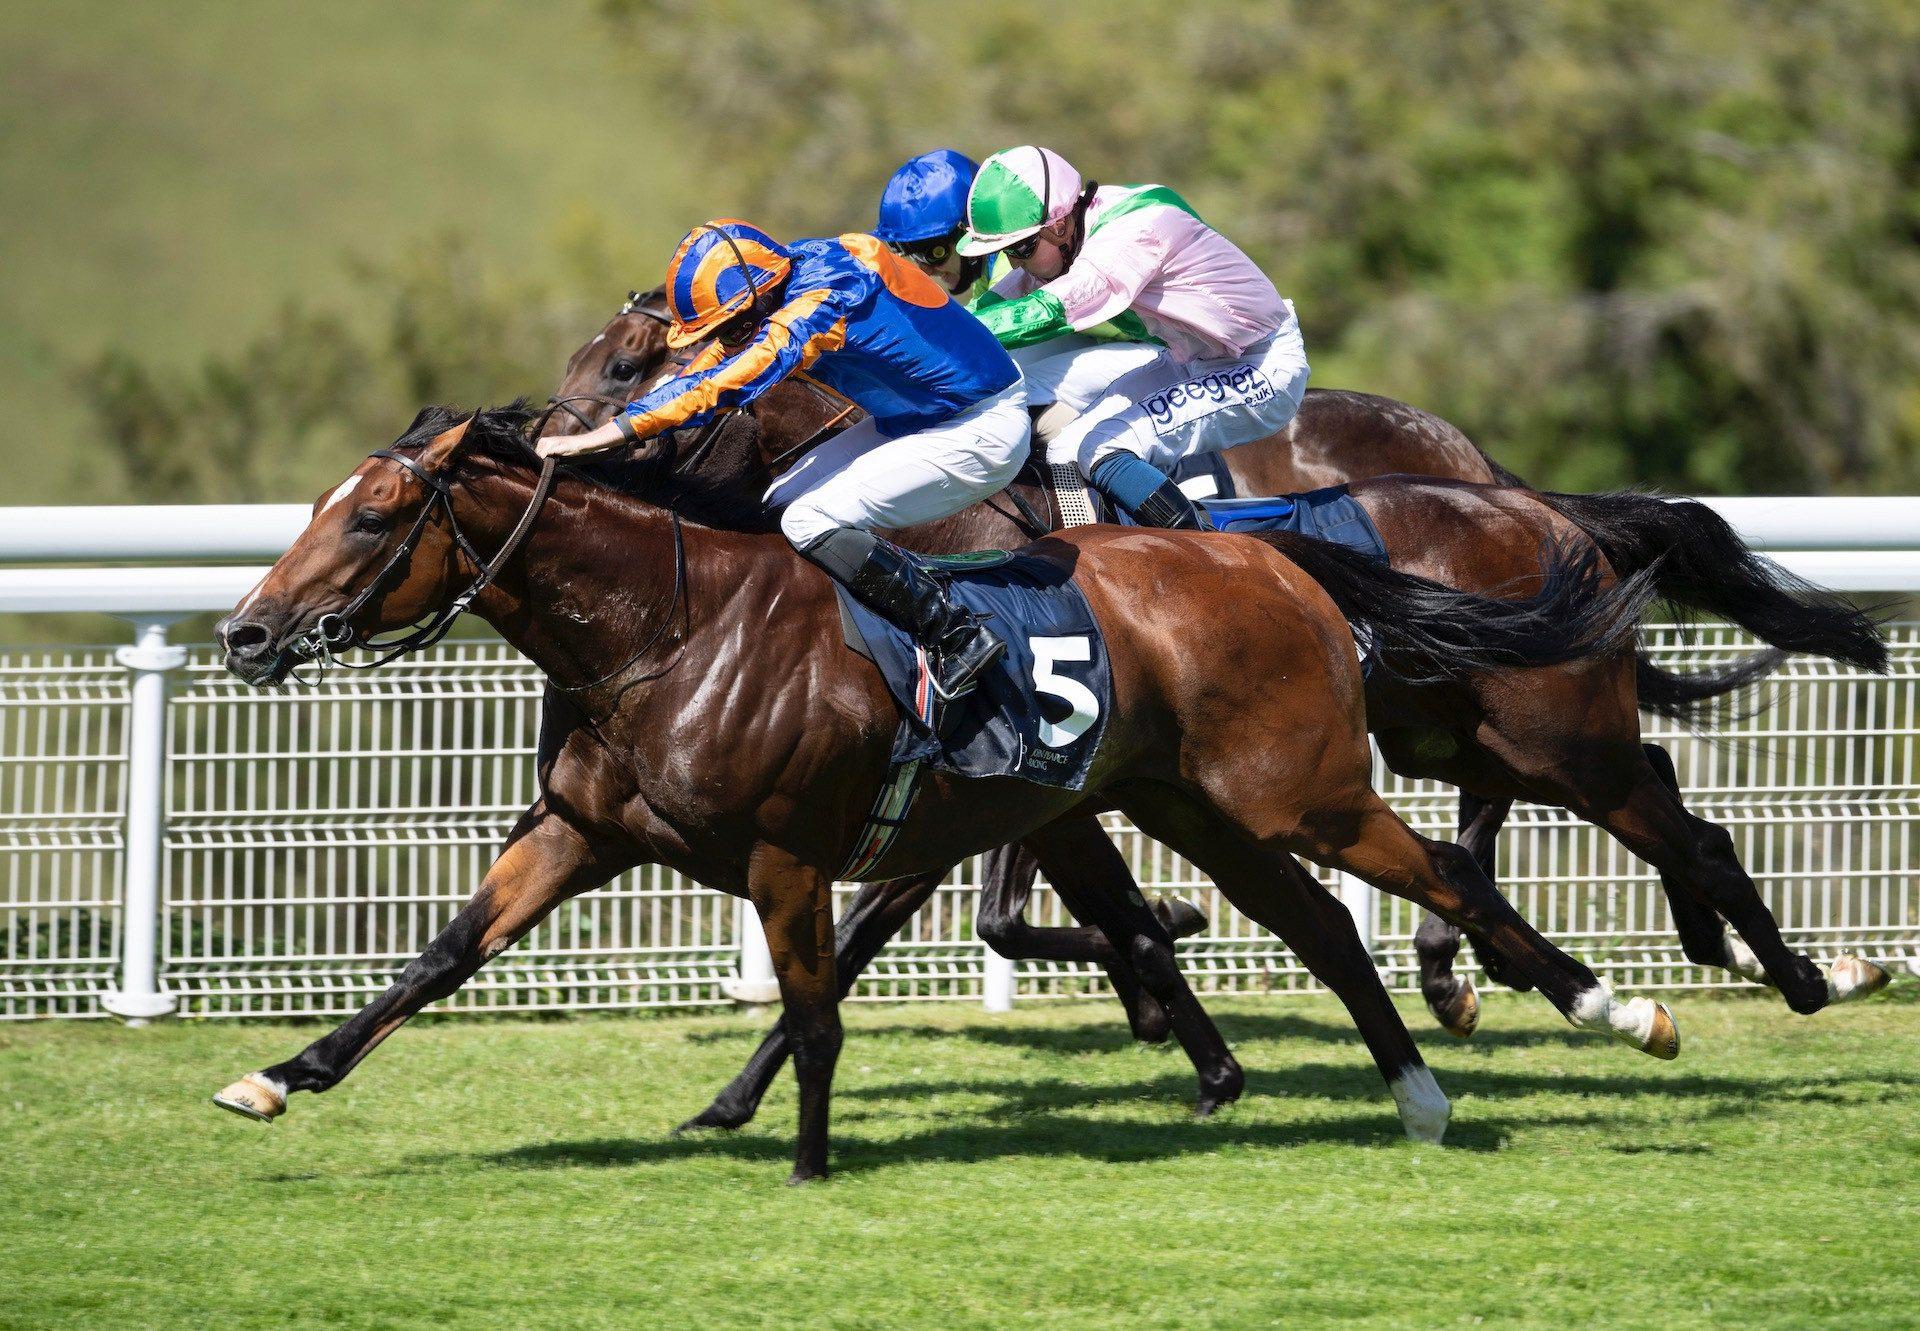 Mogul (Galileo) Wins The Gr.3 Gordon Stakes at Goodwood